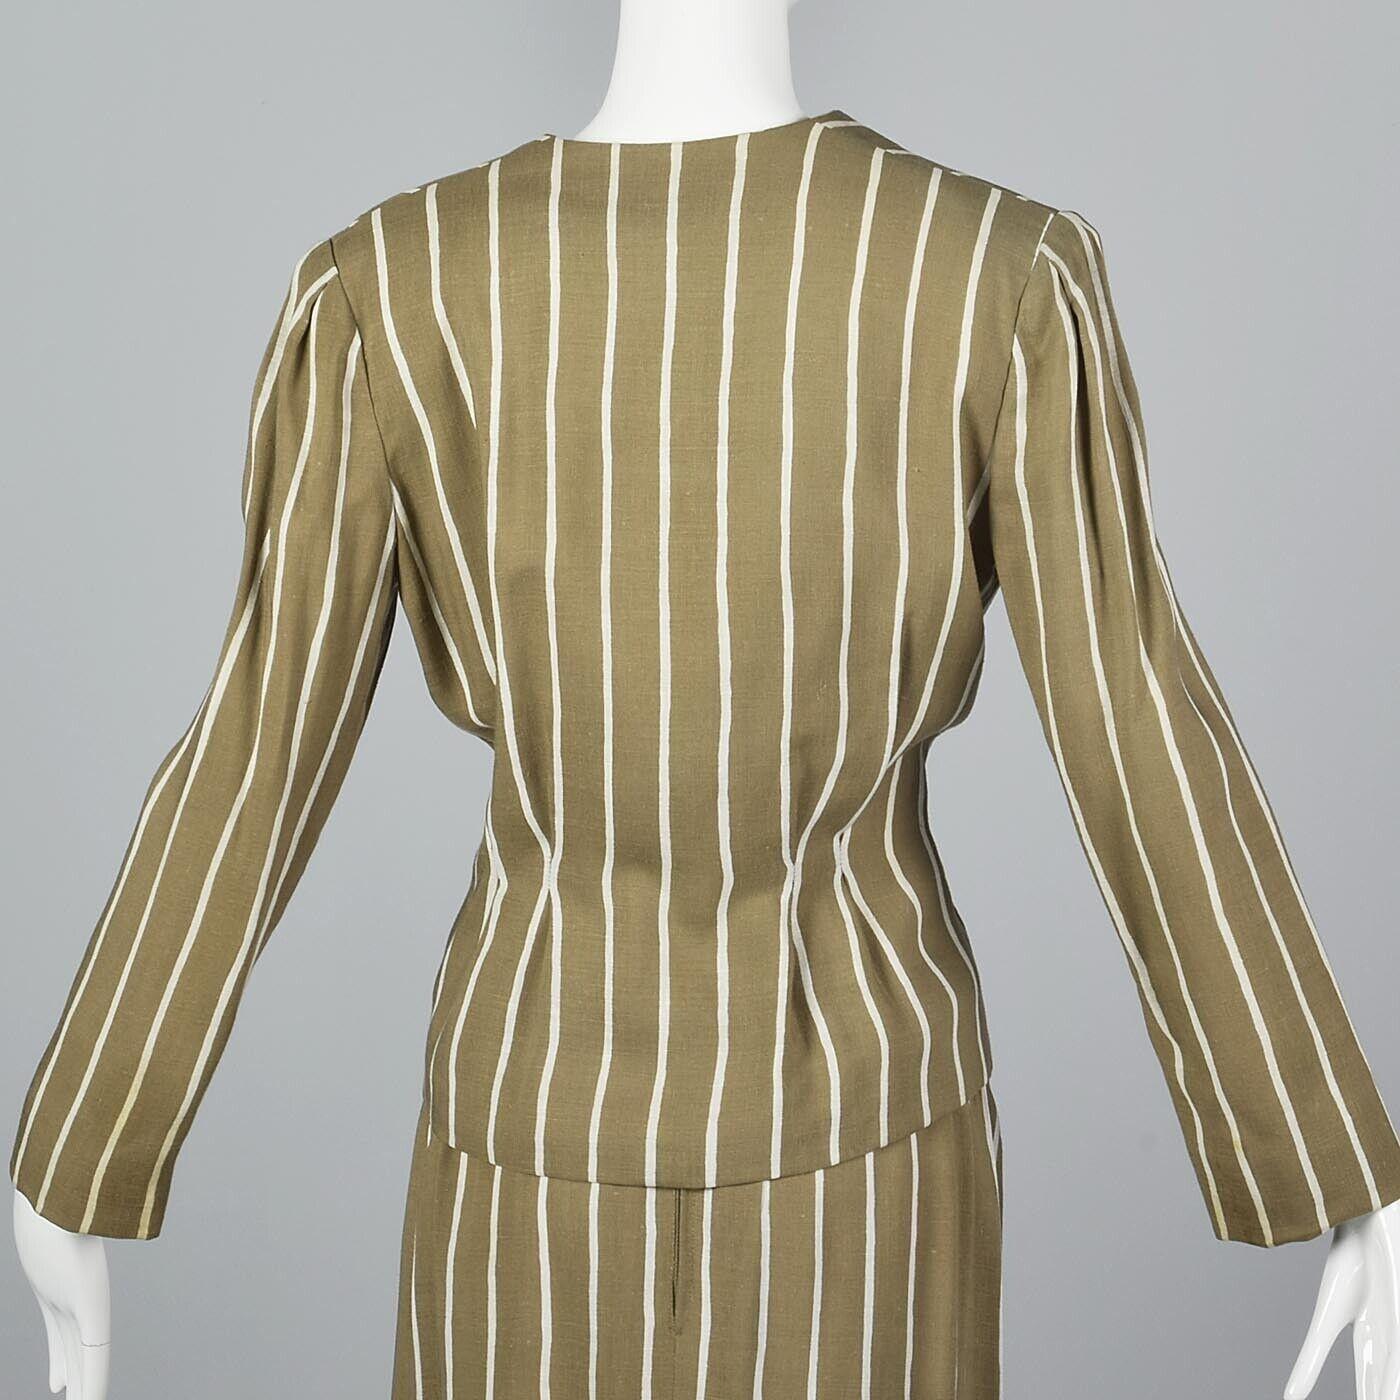 L Vintage 1980s 80s Pauline Trigere Striped Skirt… - image 7